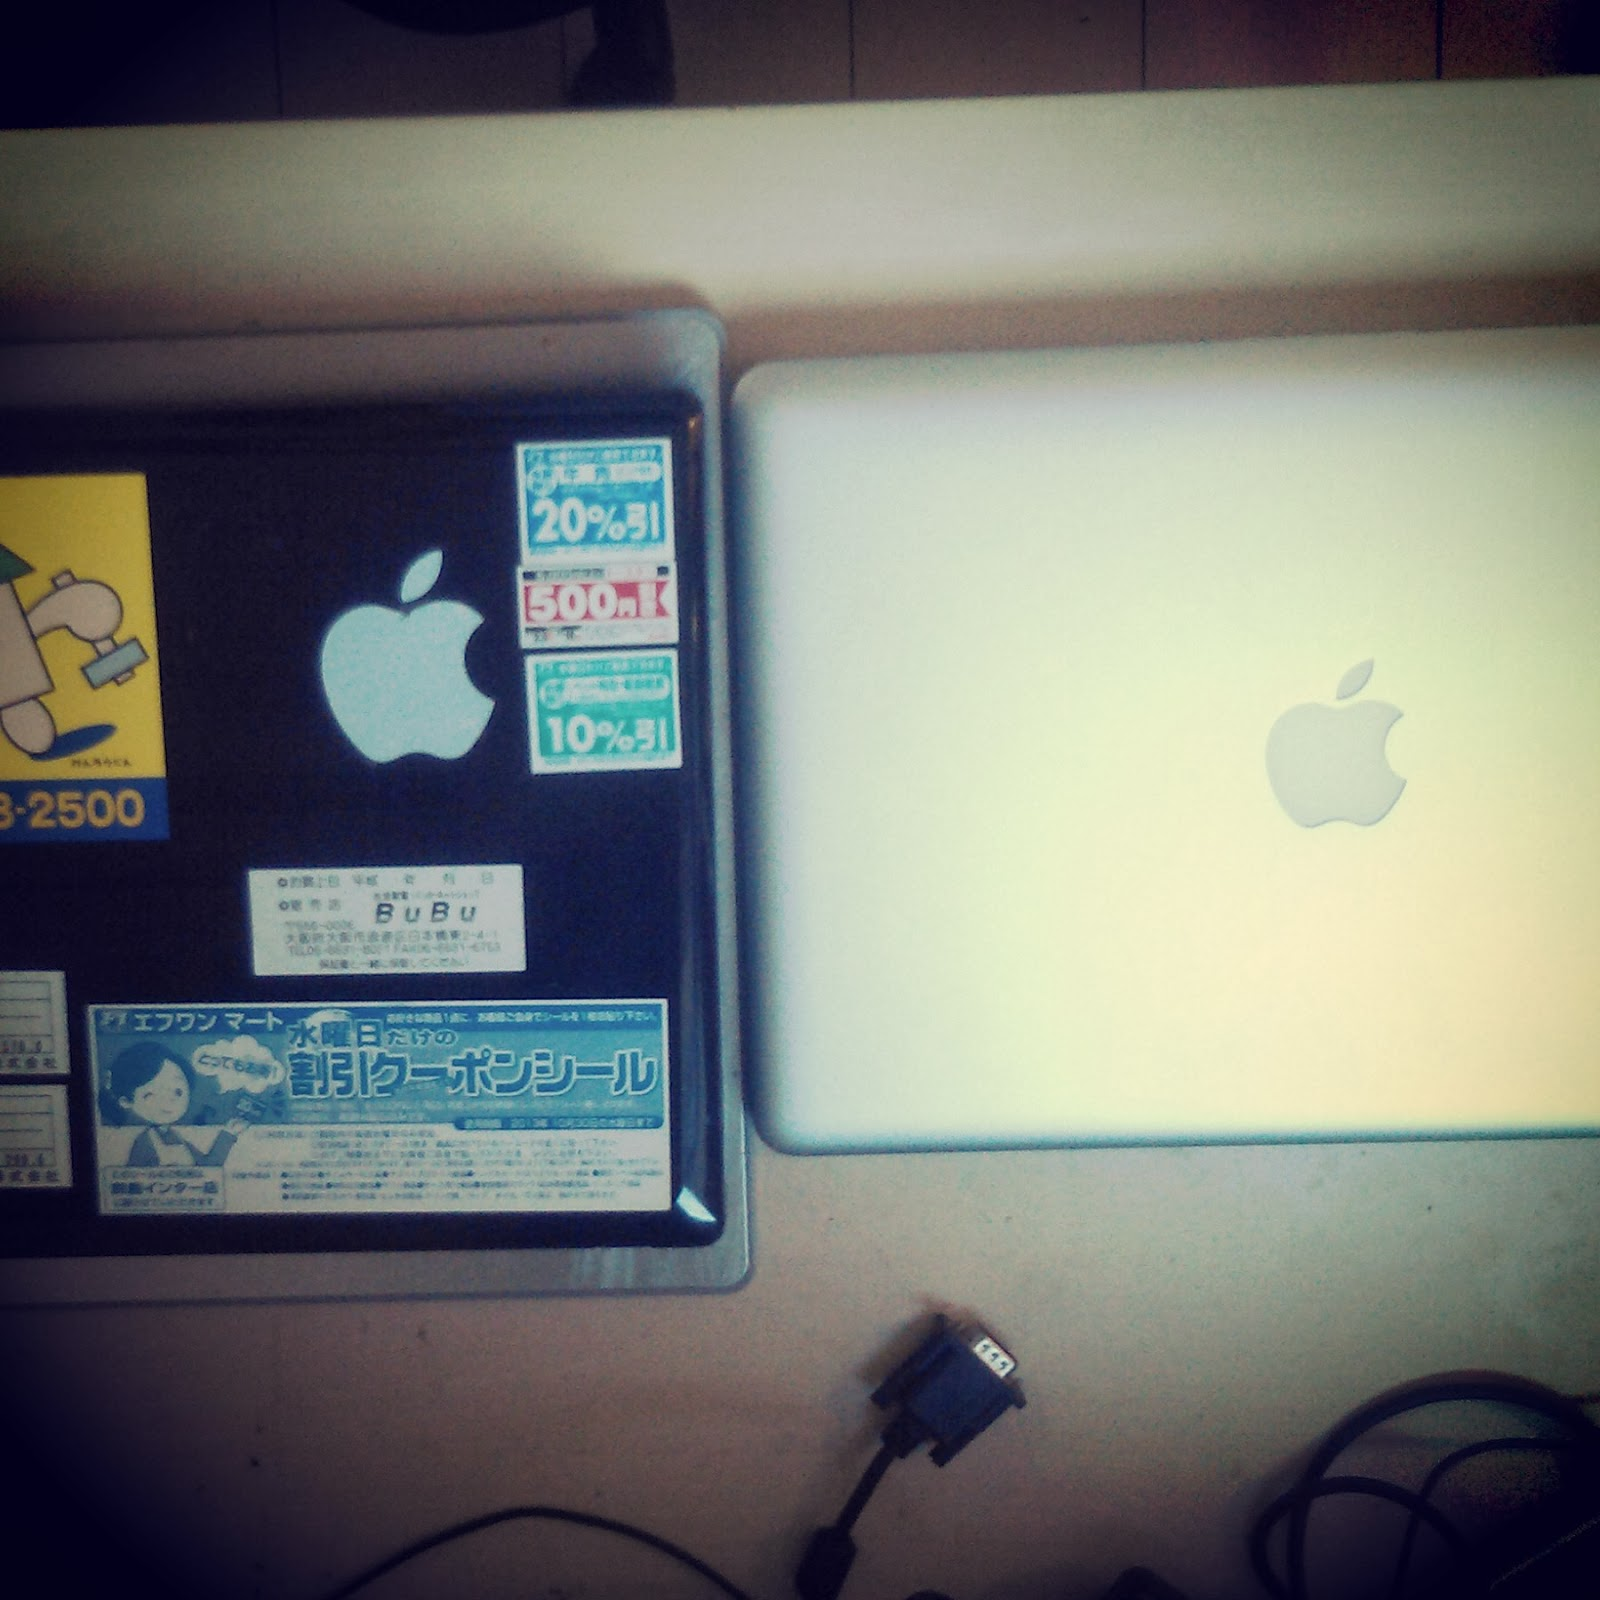 Macbook Pro 13 Quot I7 Vs Lenovo G580 I7 Bagustris Wordpress